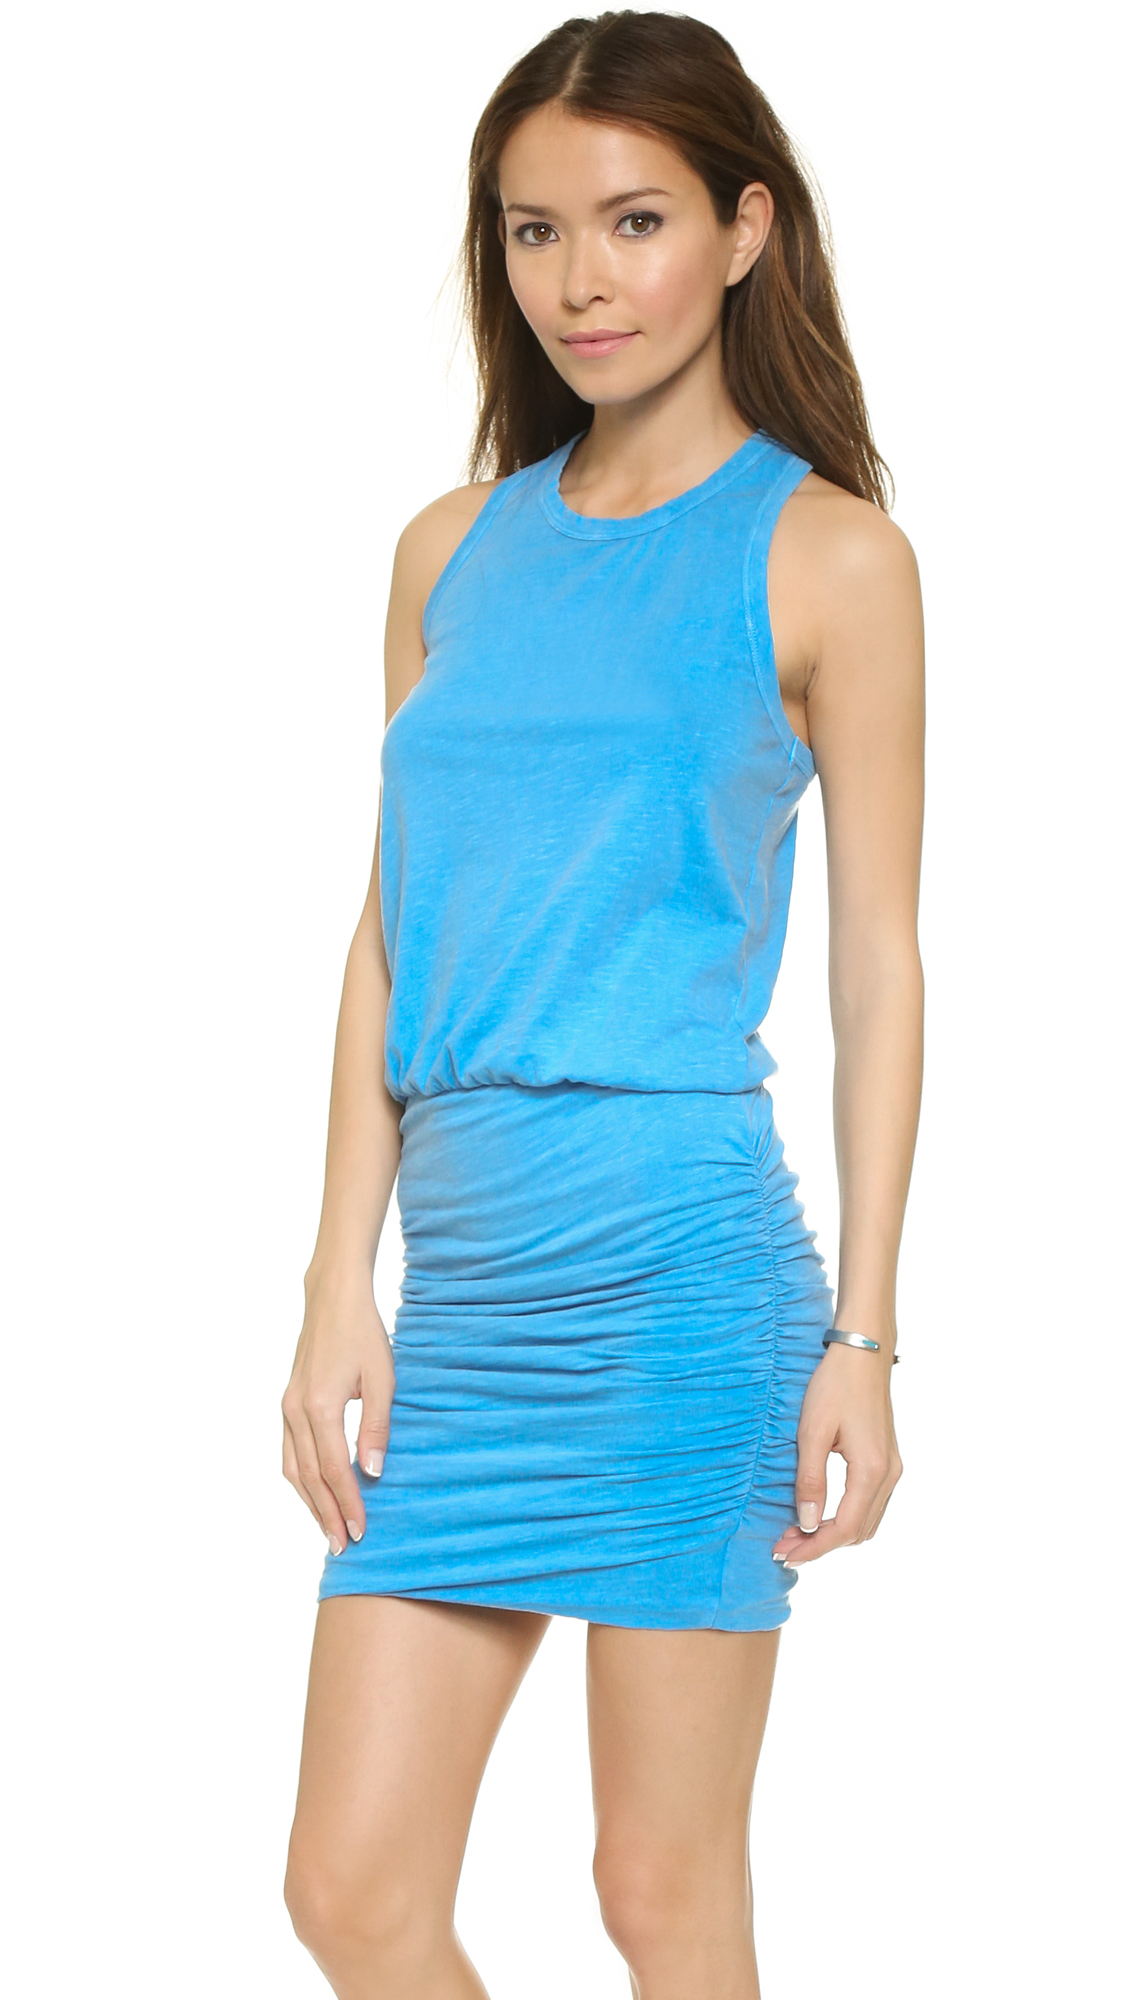 Summer Tank Dresses